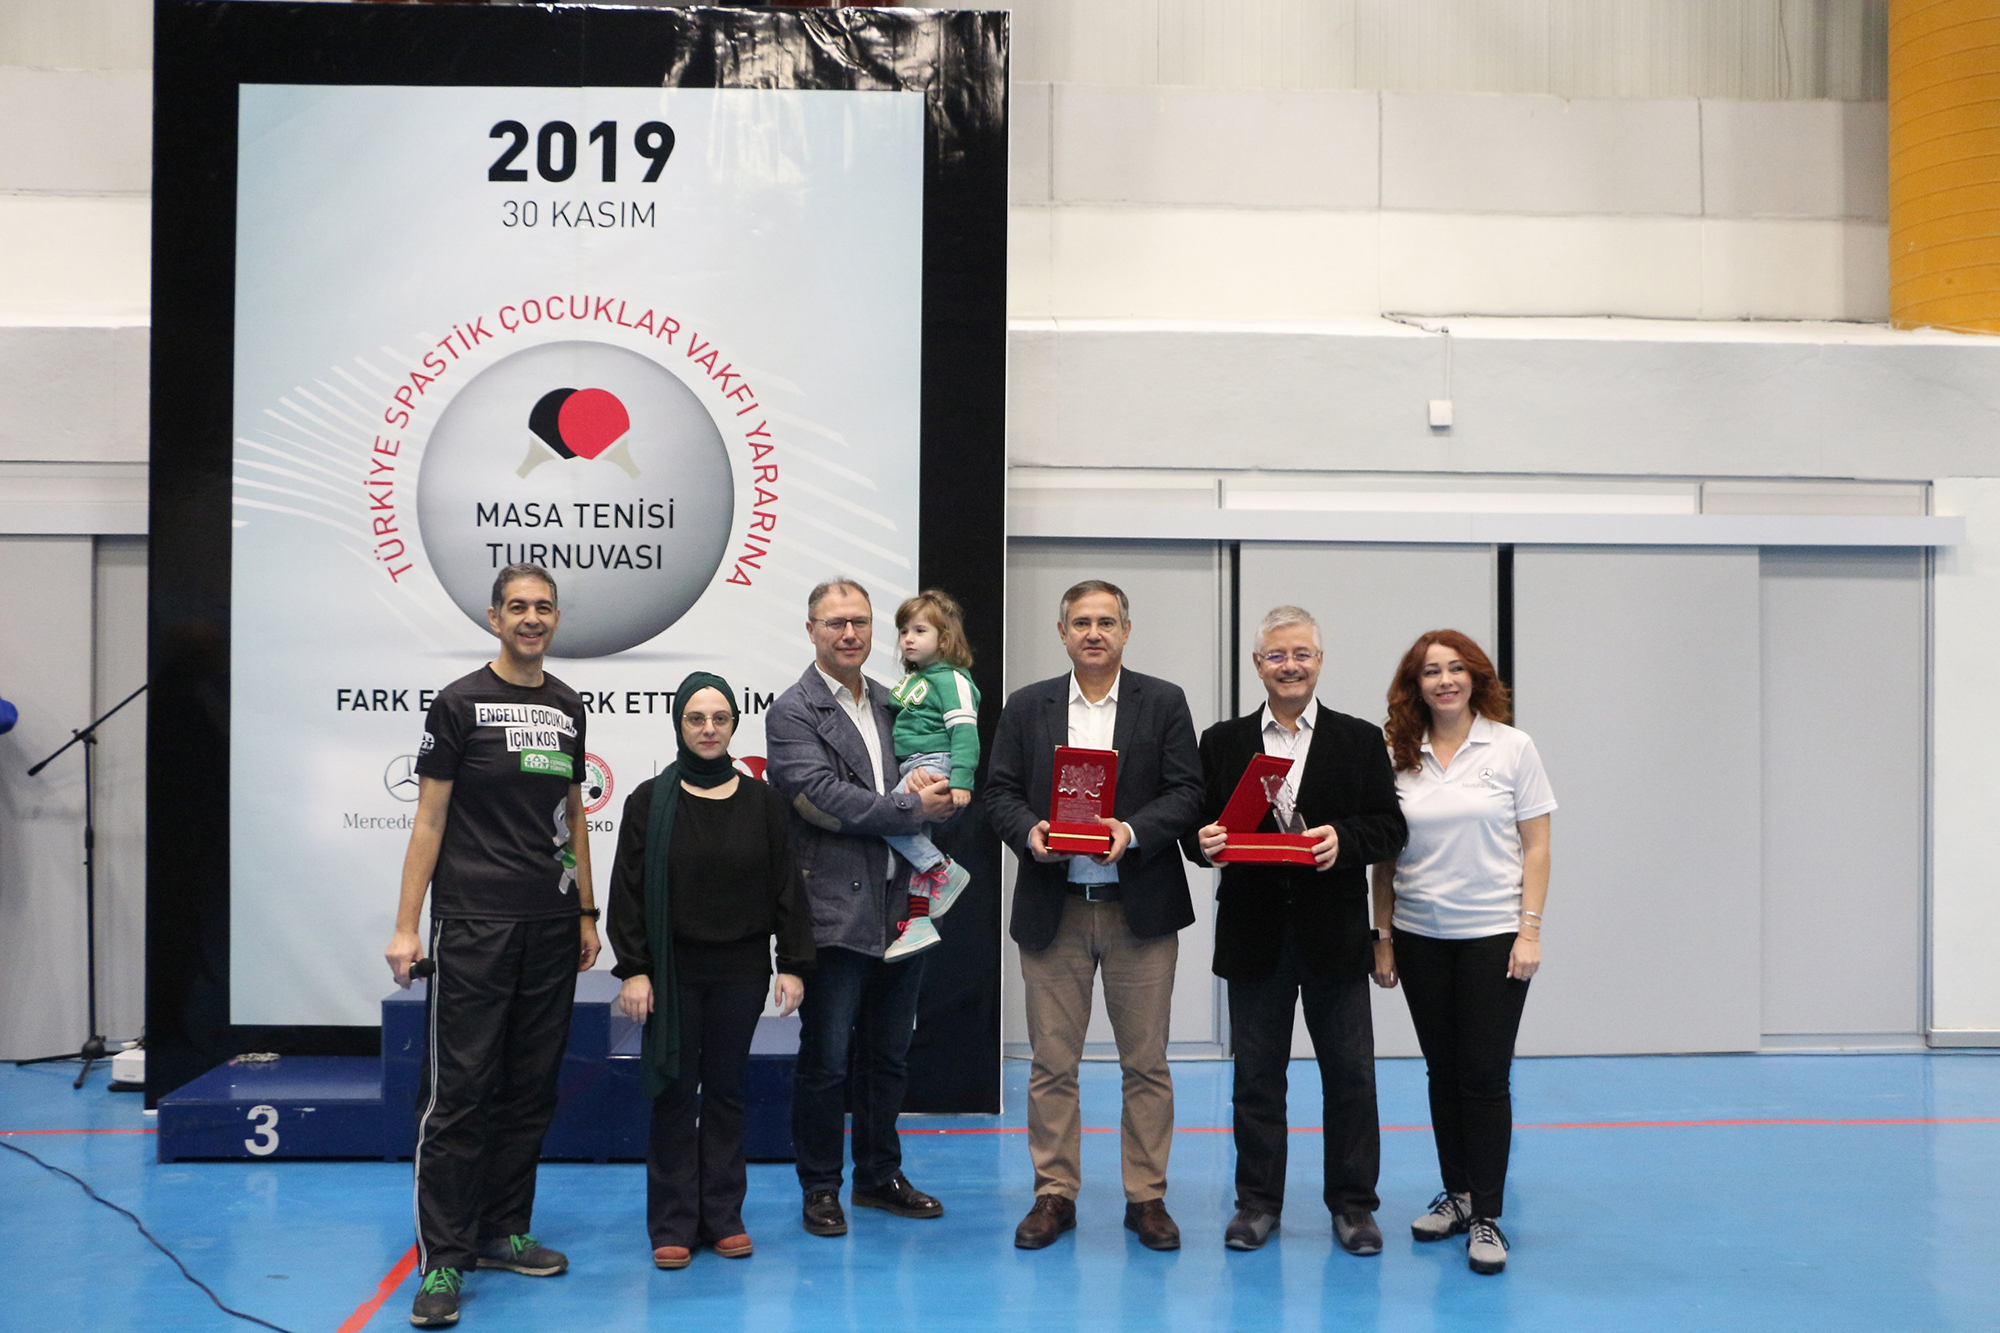 mercedes-benz-turk-10.masa-tenisi-turnuvasi.jpg